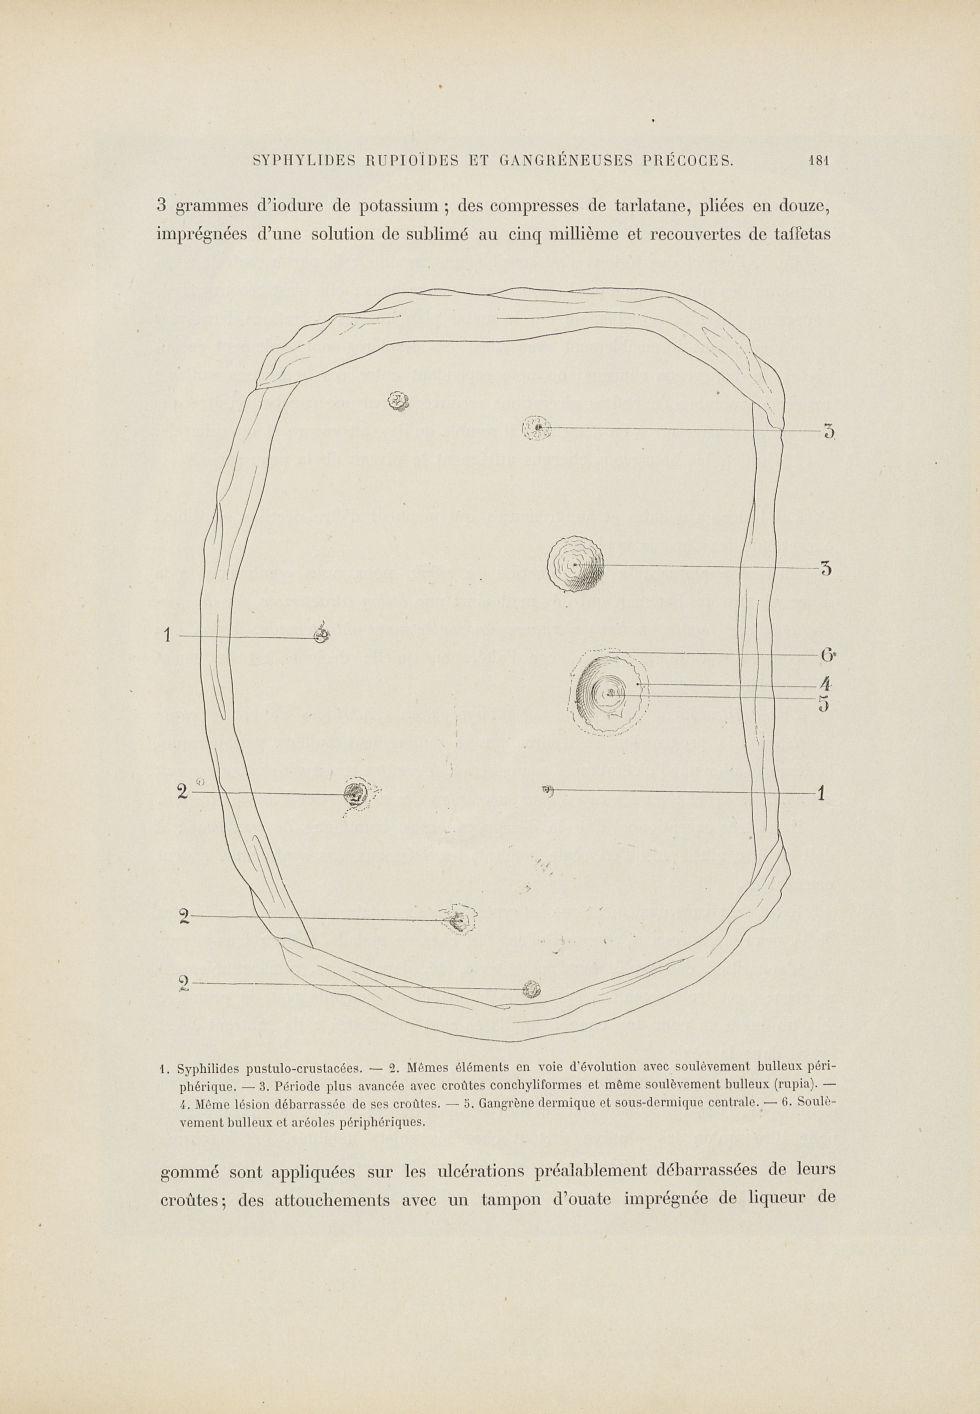 Syphilide rupoïde - Dermatologie (peau). Syphilis (maladies infectieuses). Maladies sexuellement transmissibles. 19e siècle (France) - med01740x0215